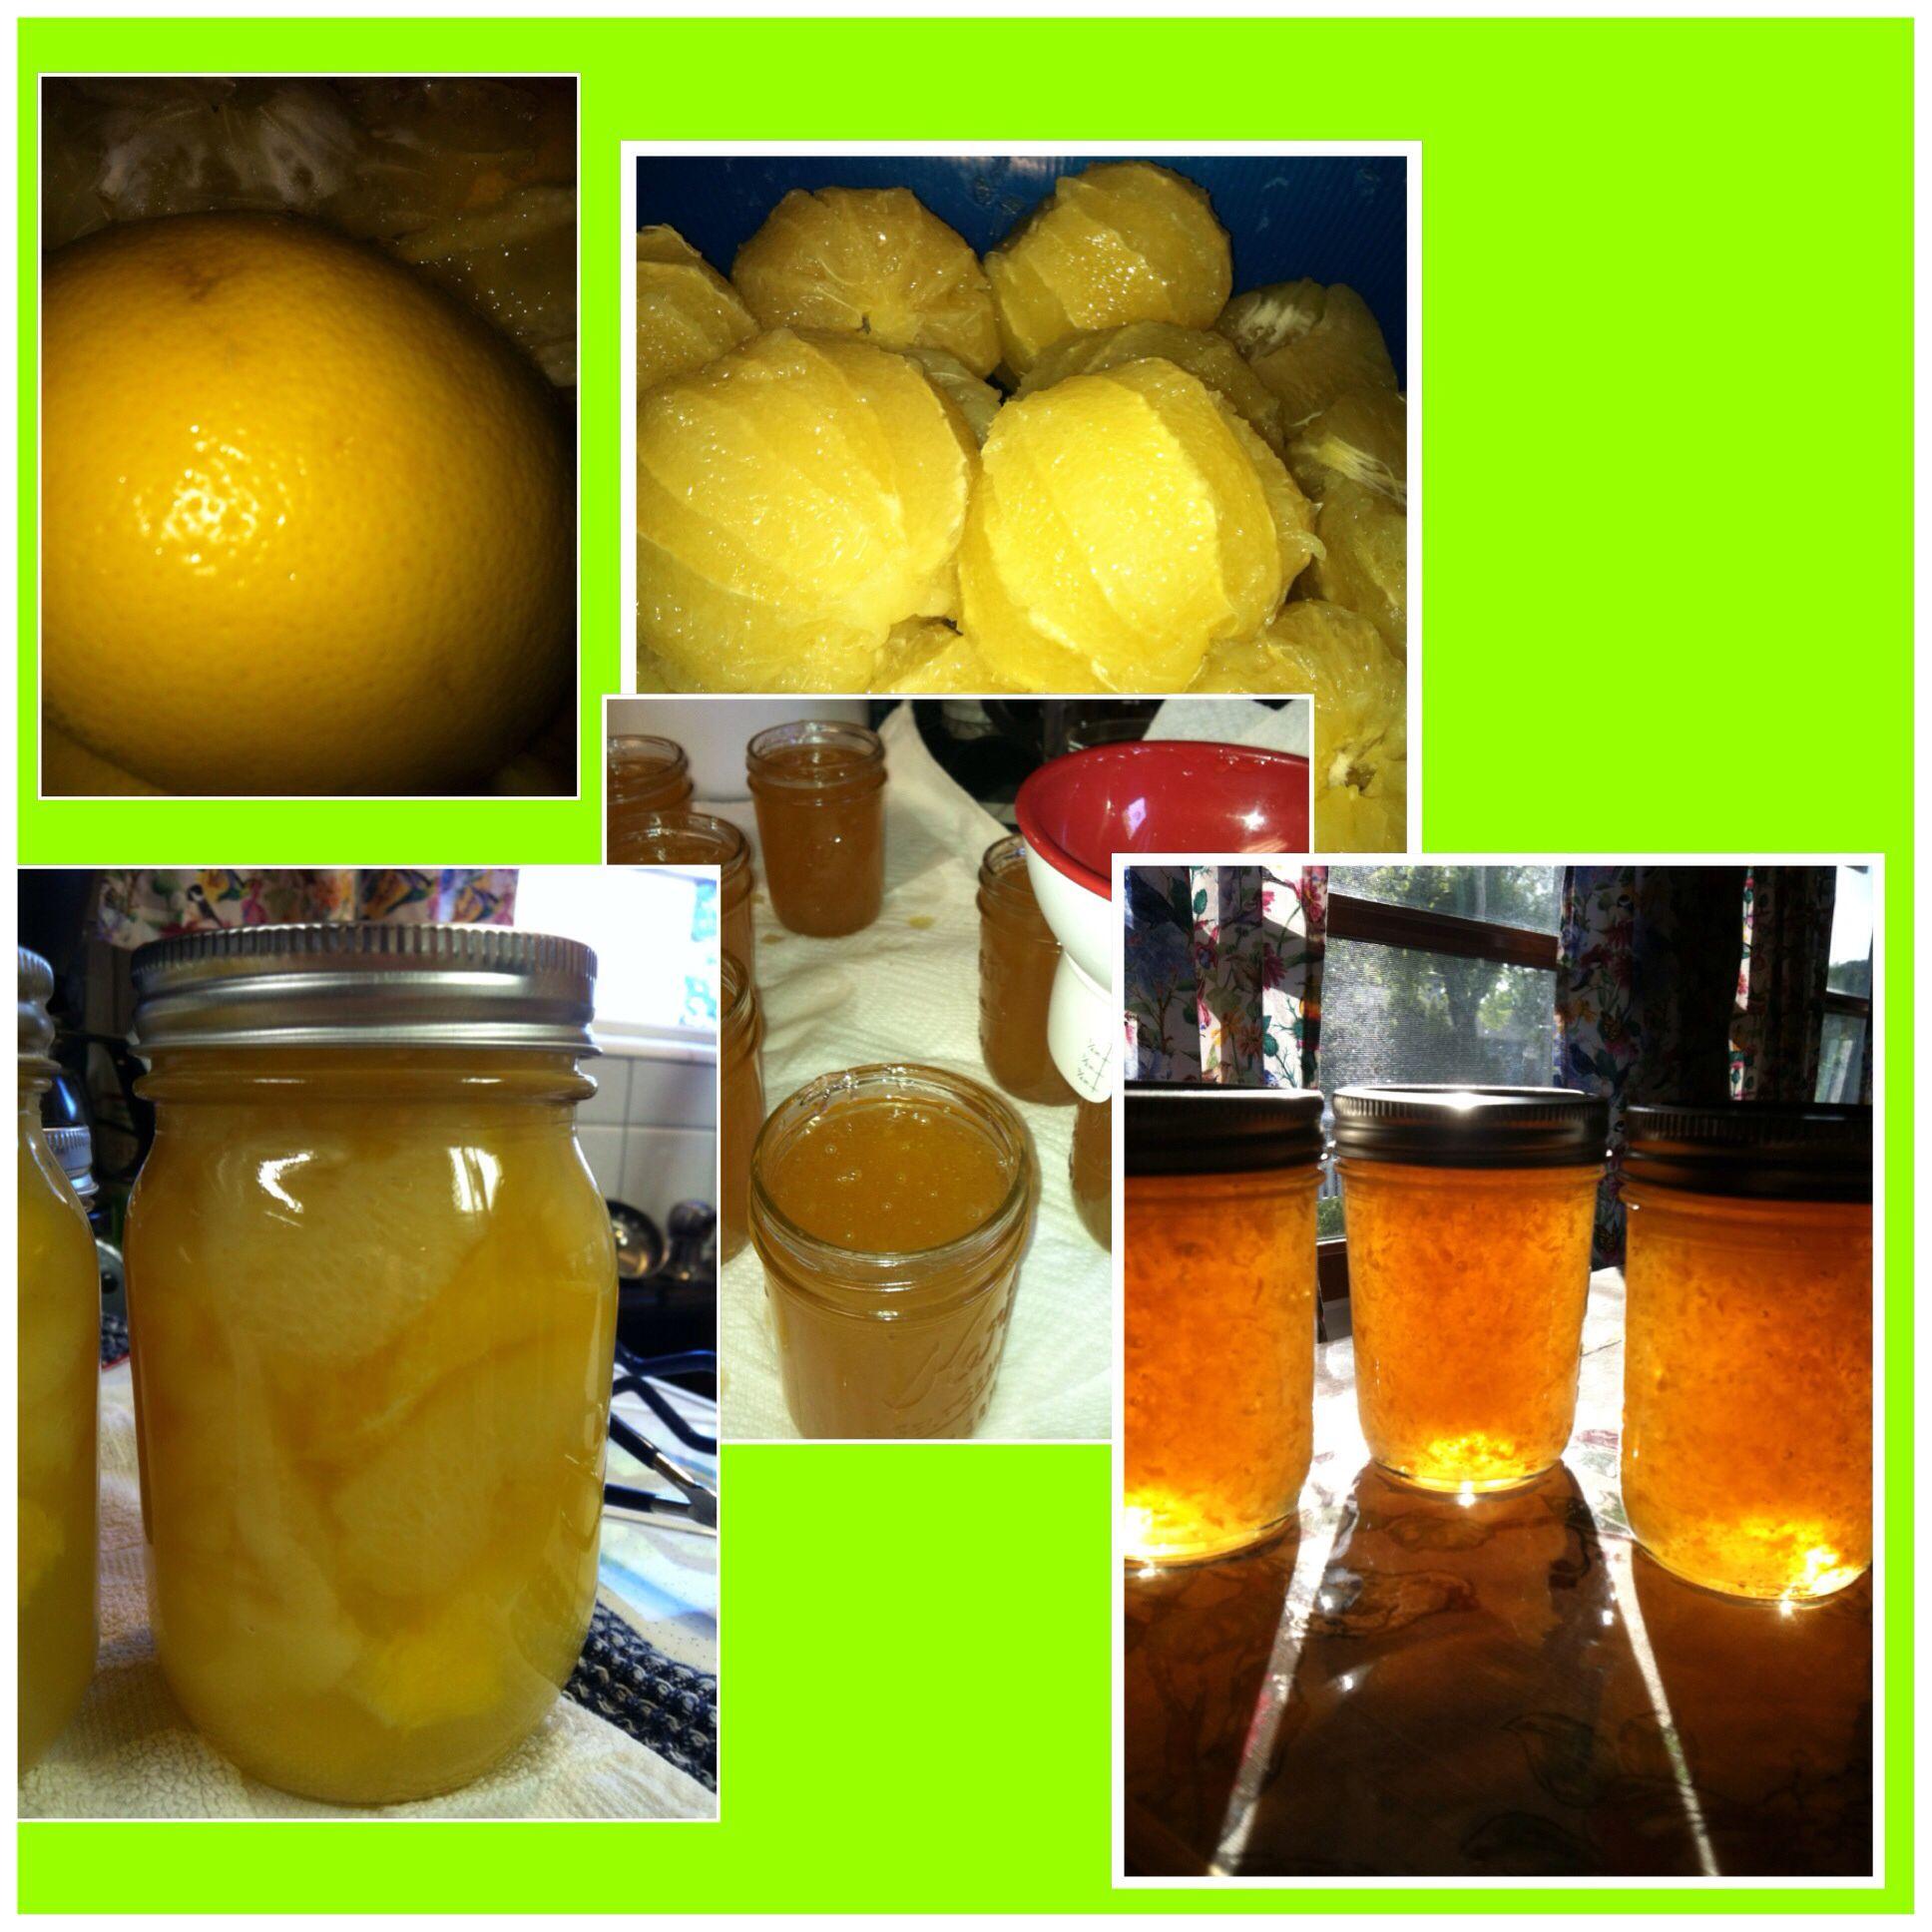 Canning grapefruit ....